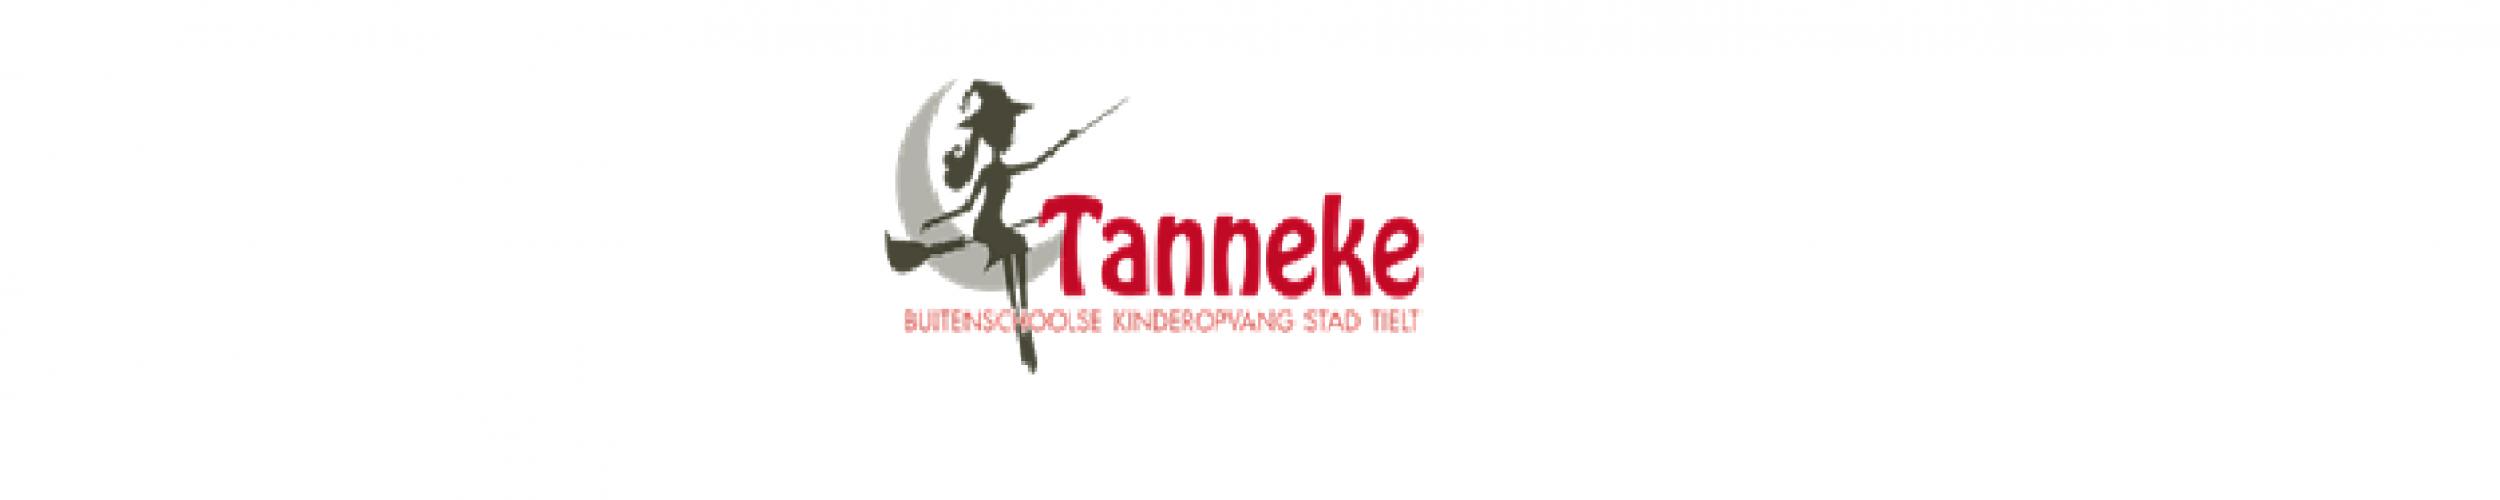 Buitenschoolse kinderopvang Tielt  'Tanneke'